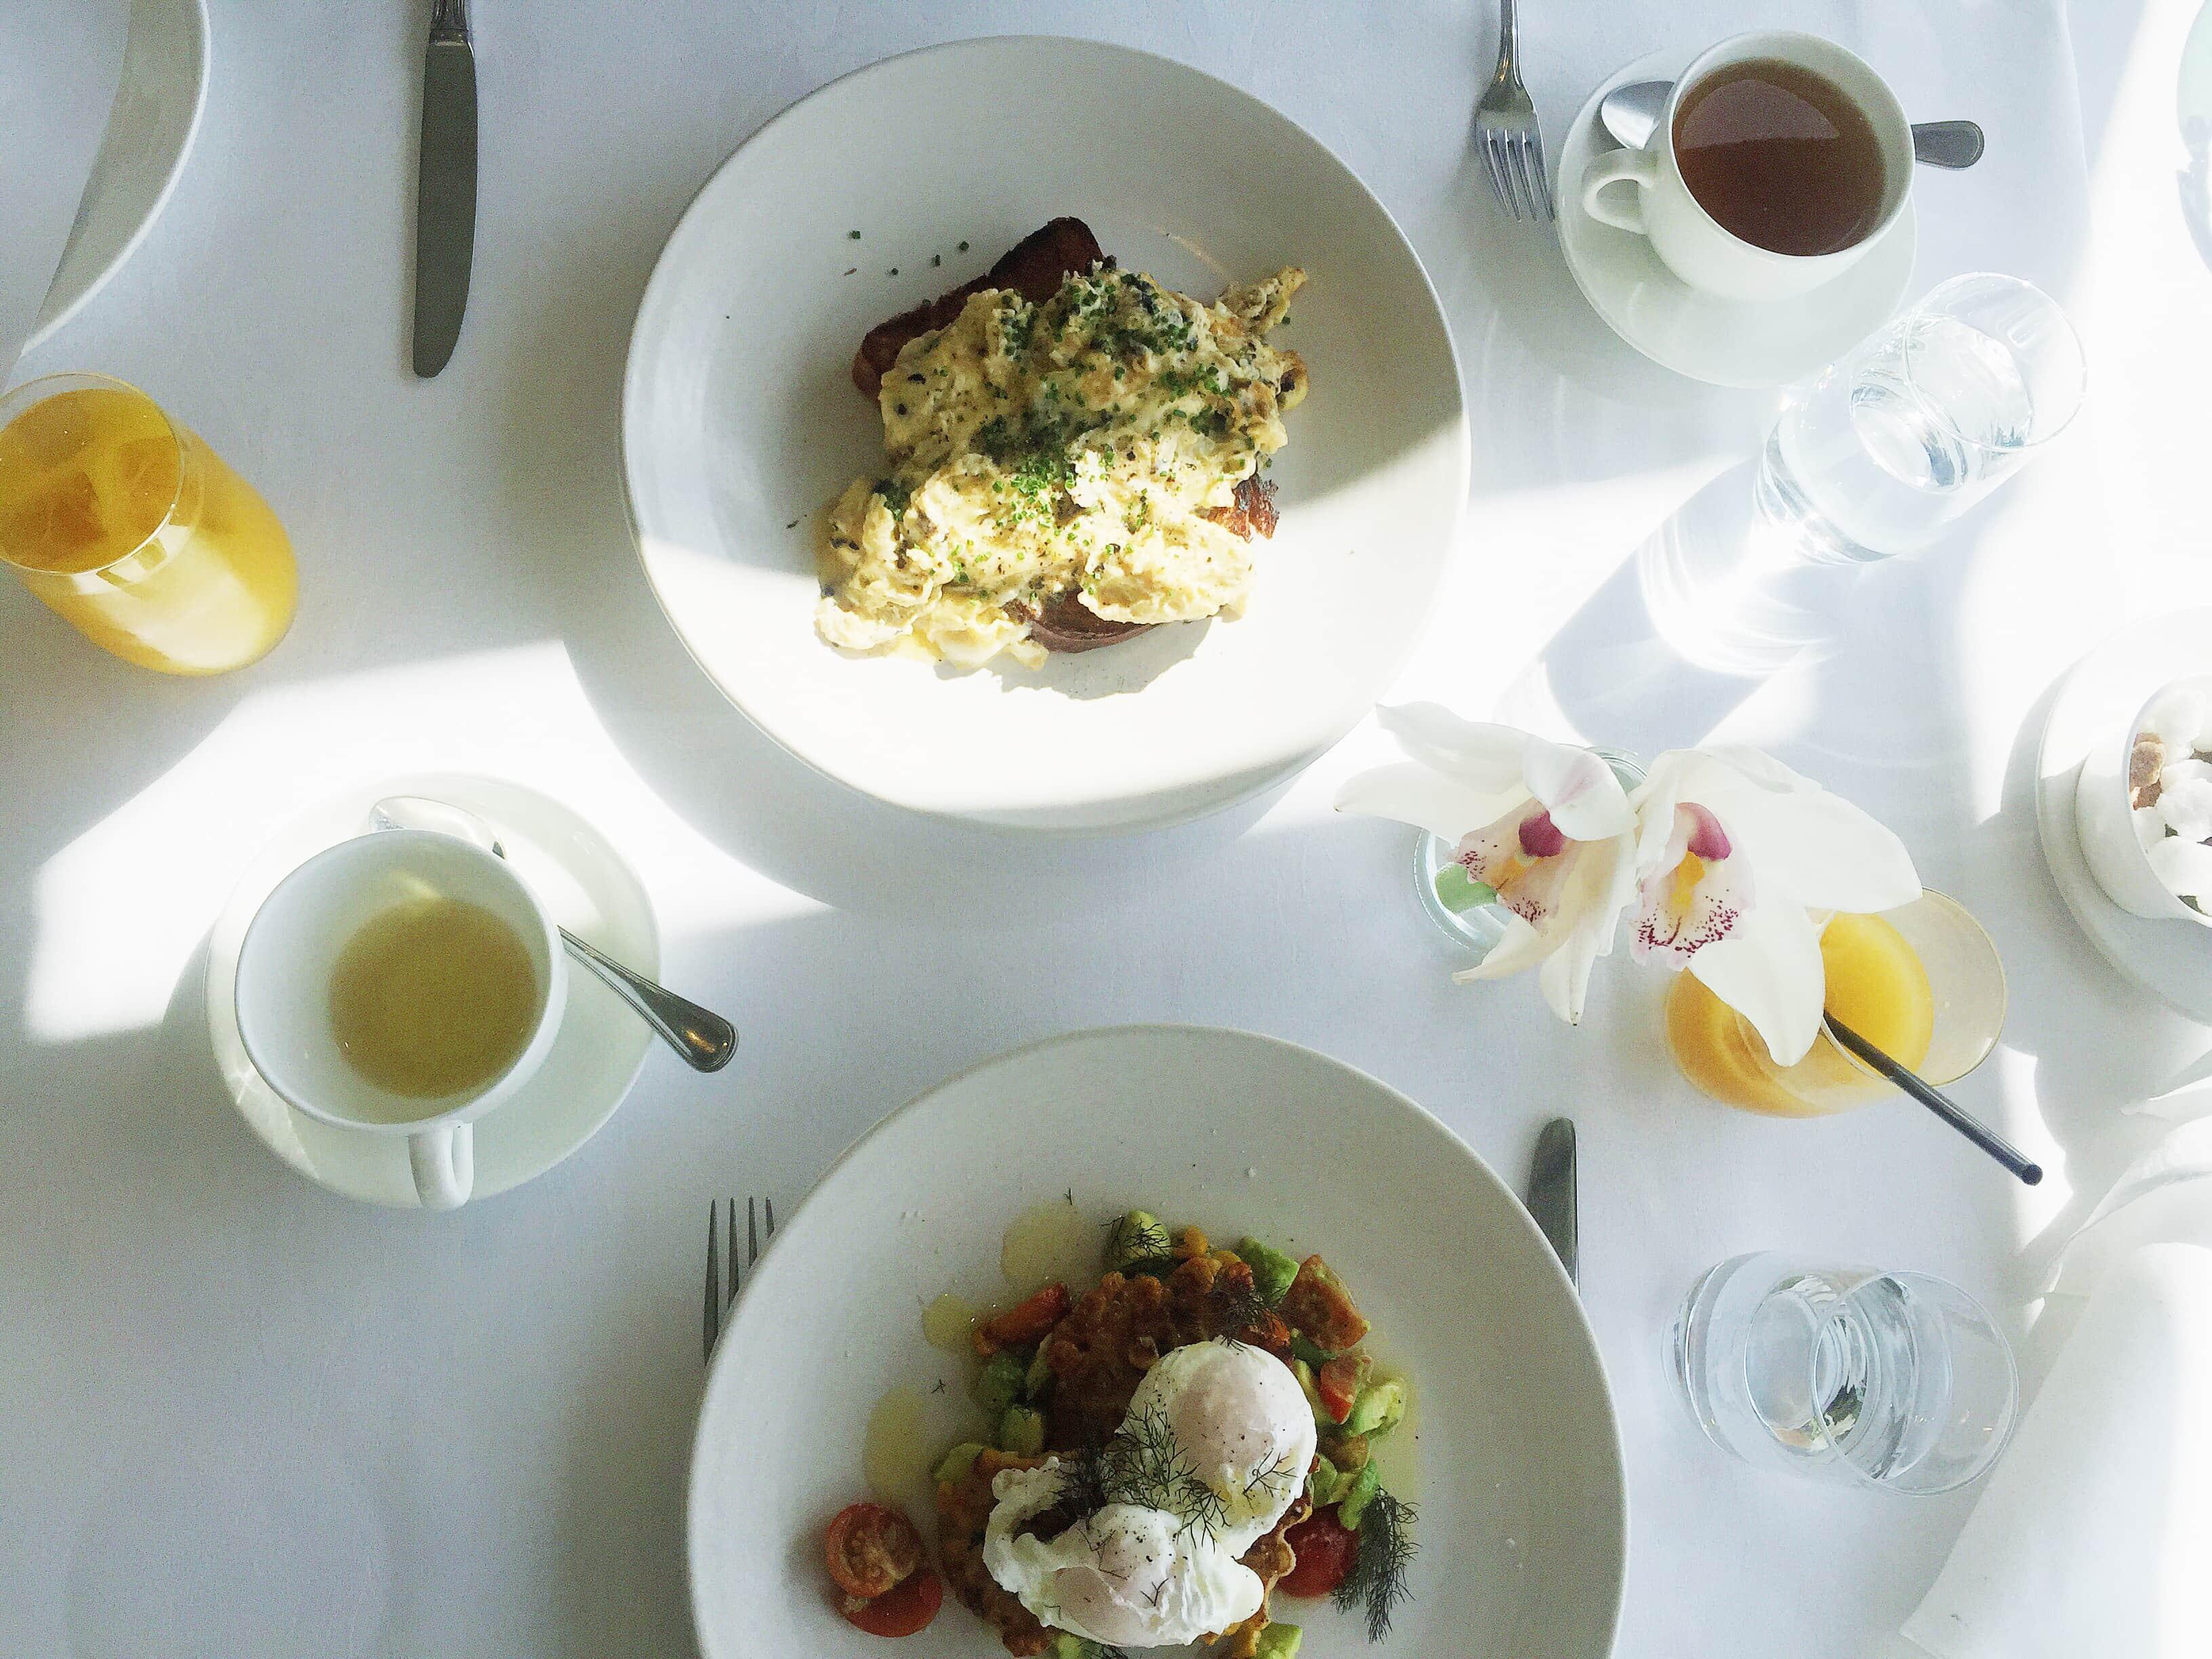 Breakfast at Jonah's